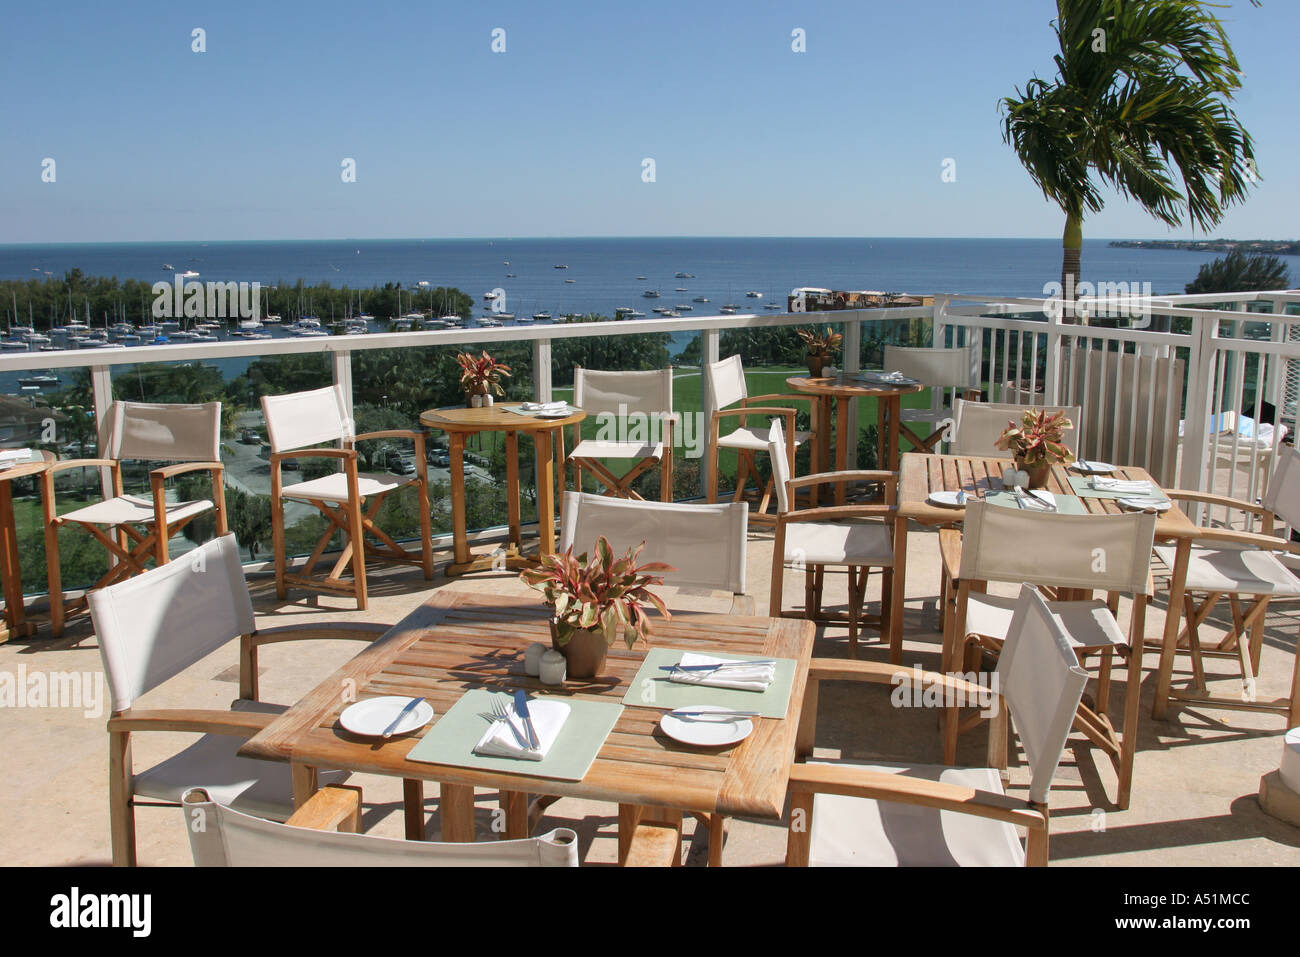 Fl Hotels And Restaurants